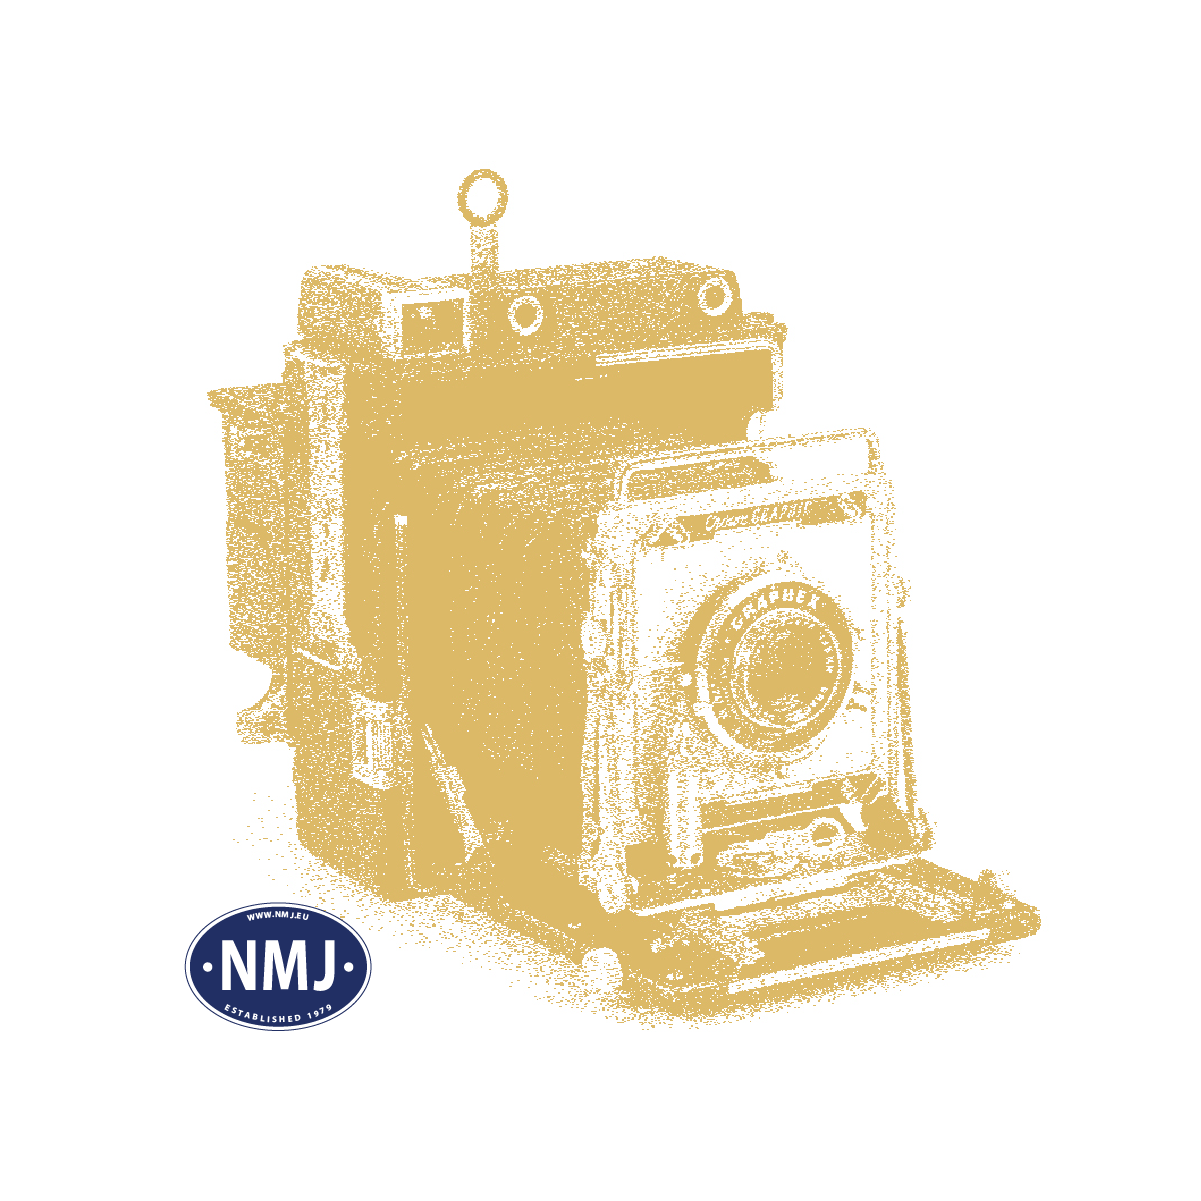 NMJT90303 - NMJ Topline CFL Diesellok 1604 (1971 -->), DC